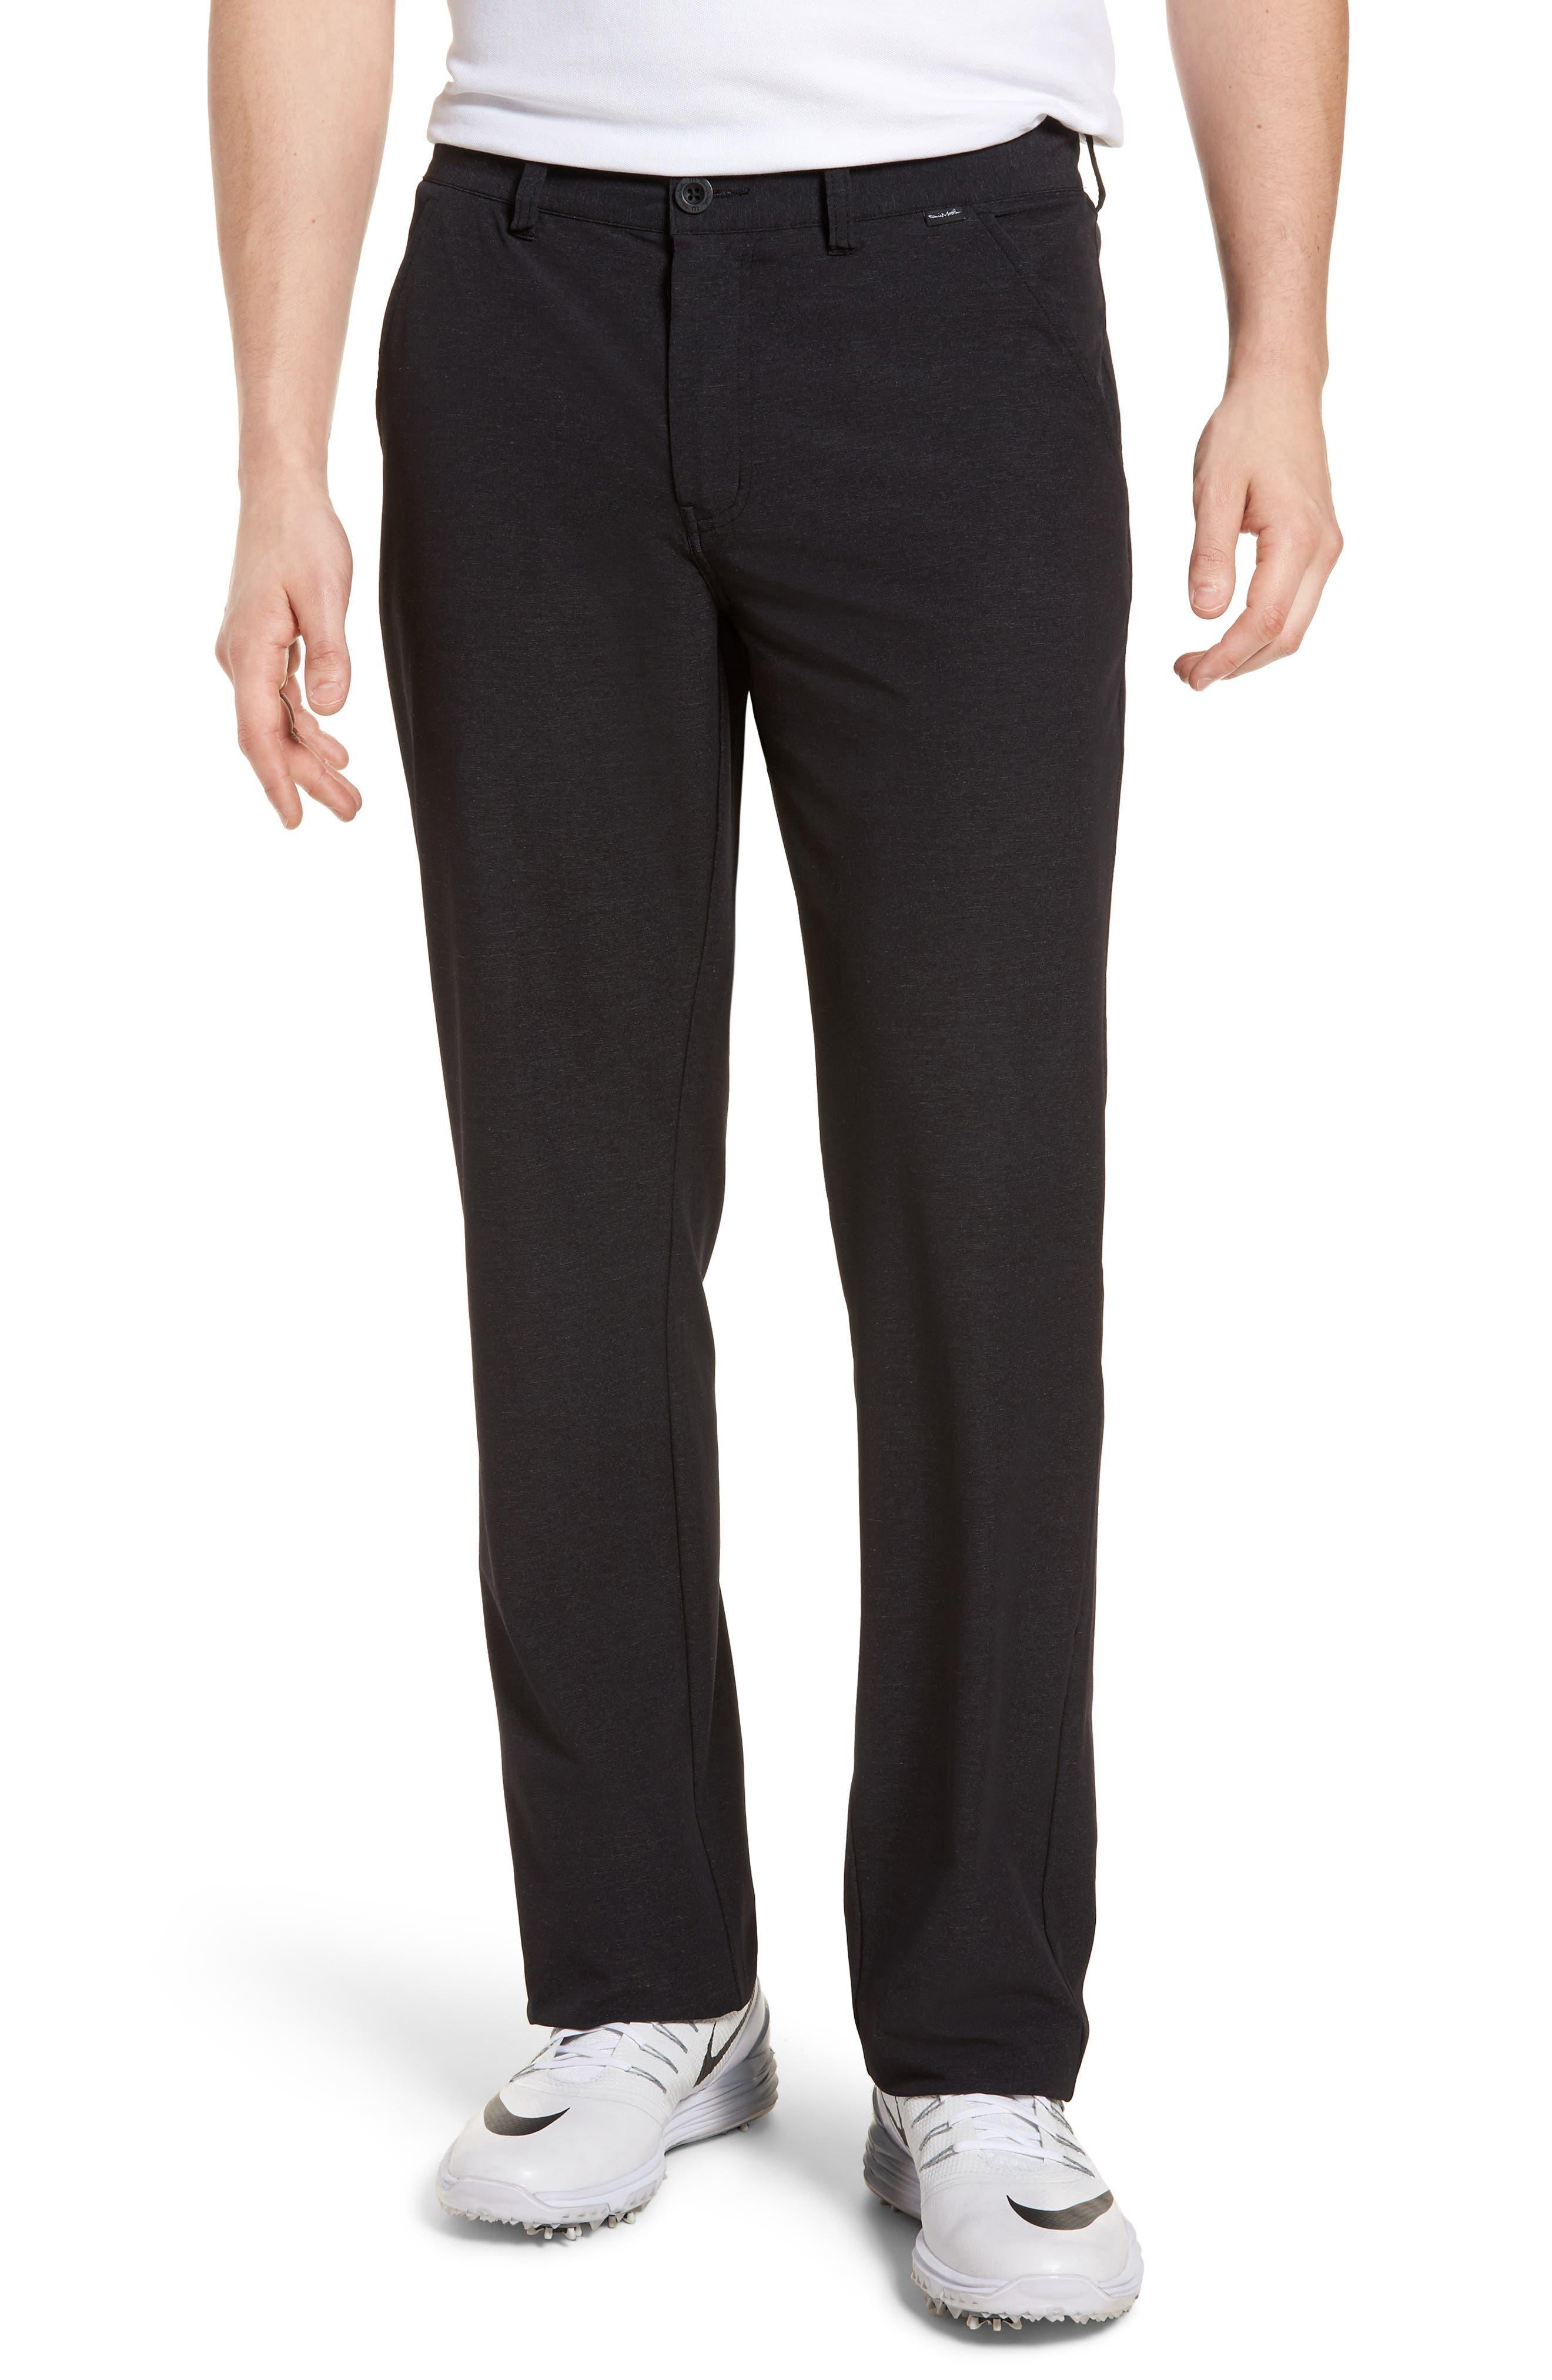 Mercurio Regular Fit Four-Way Stretch Pants,                         Main,                         color, HEATHER BLACK